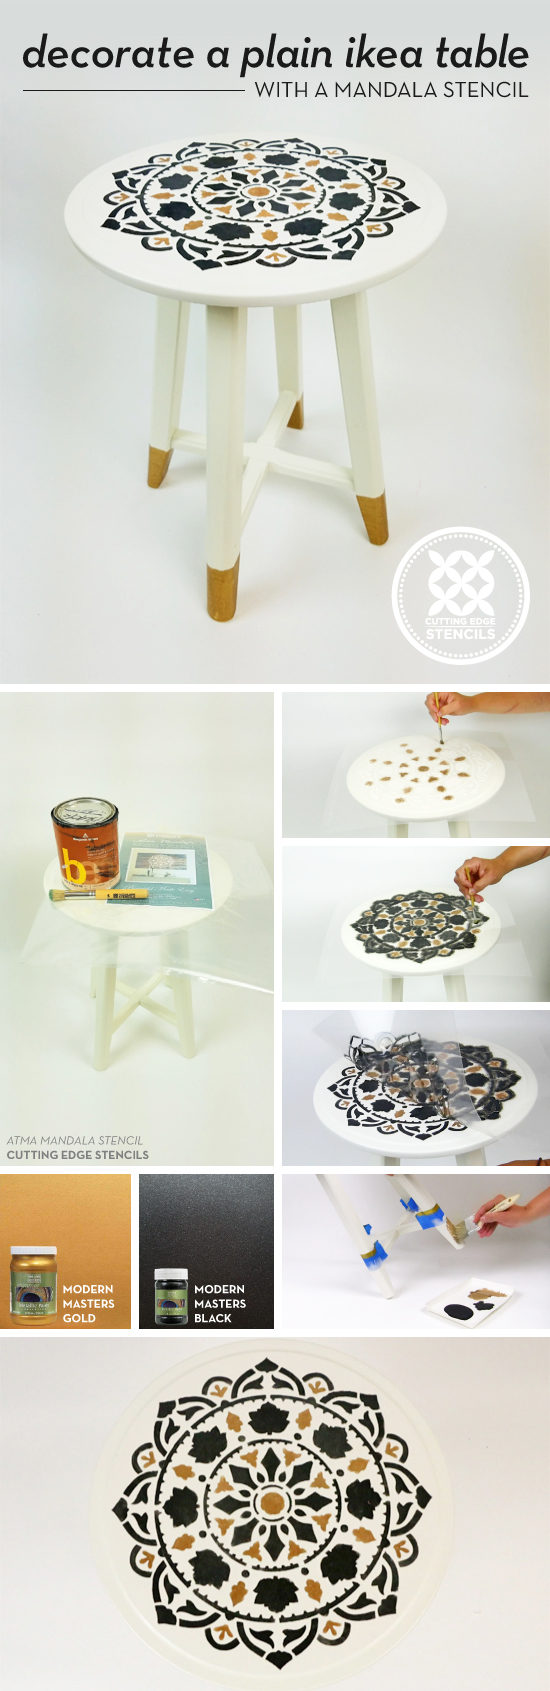 Cutting Edge Stencils shares how to enhance plain Ikea nesting tables using the Atma Mandala Stencil. http://www.cuttingedgestencils.com/stencil-mandala-atma-medallion-deisgn-stencils.html